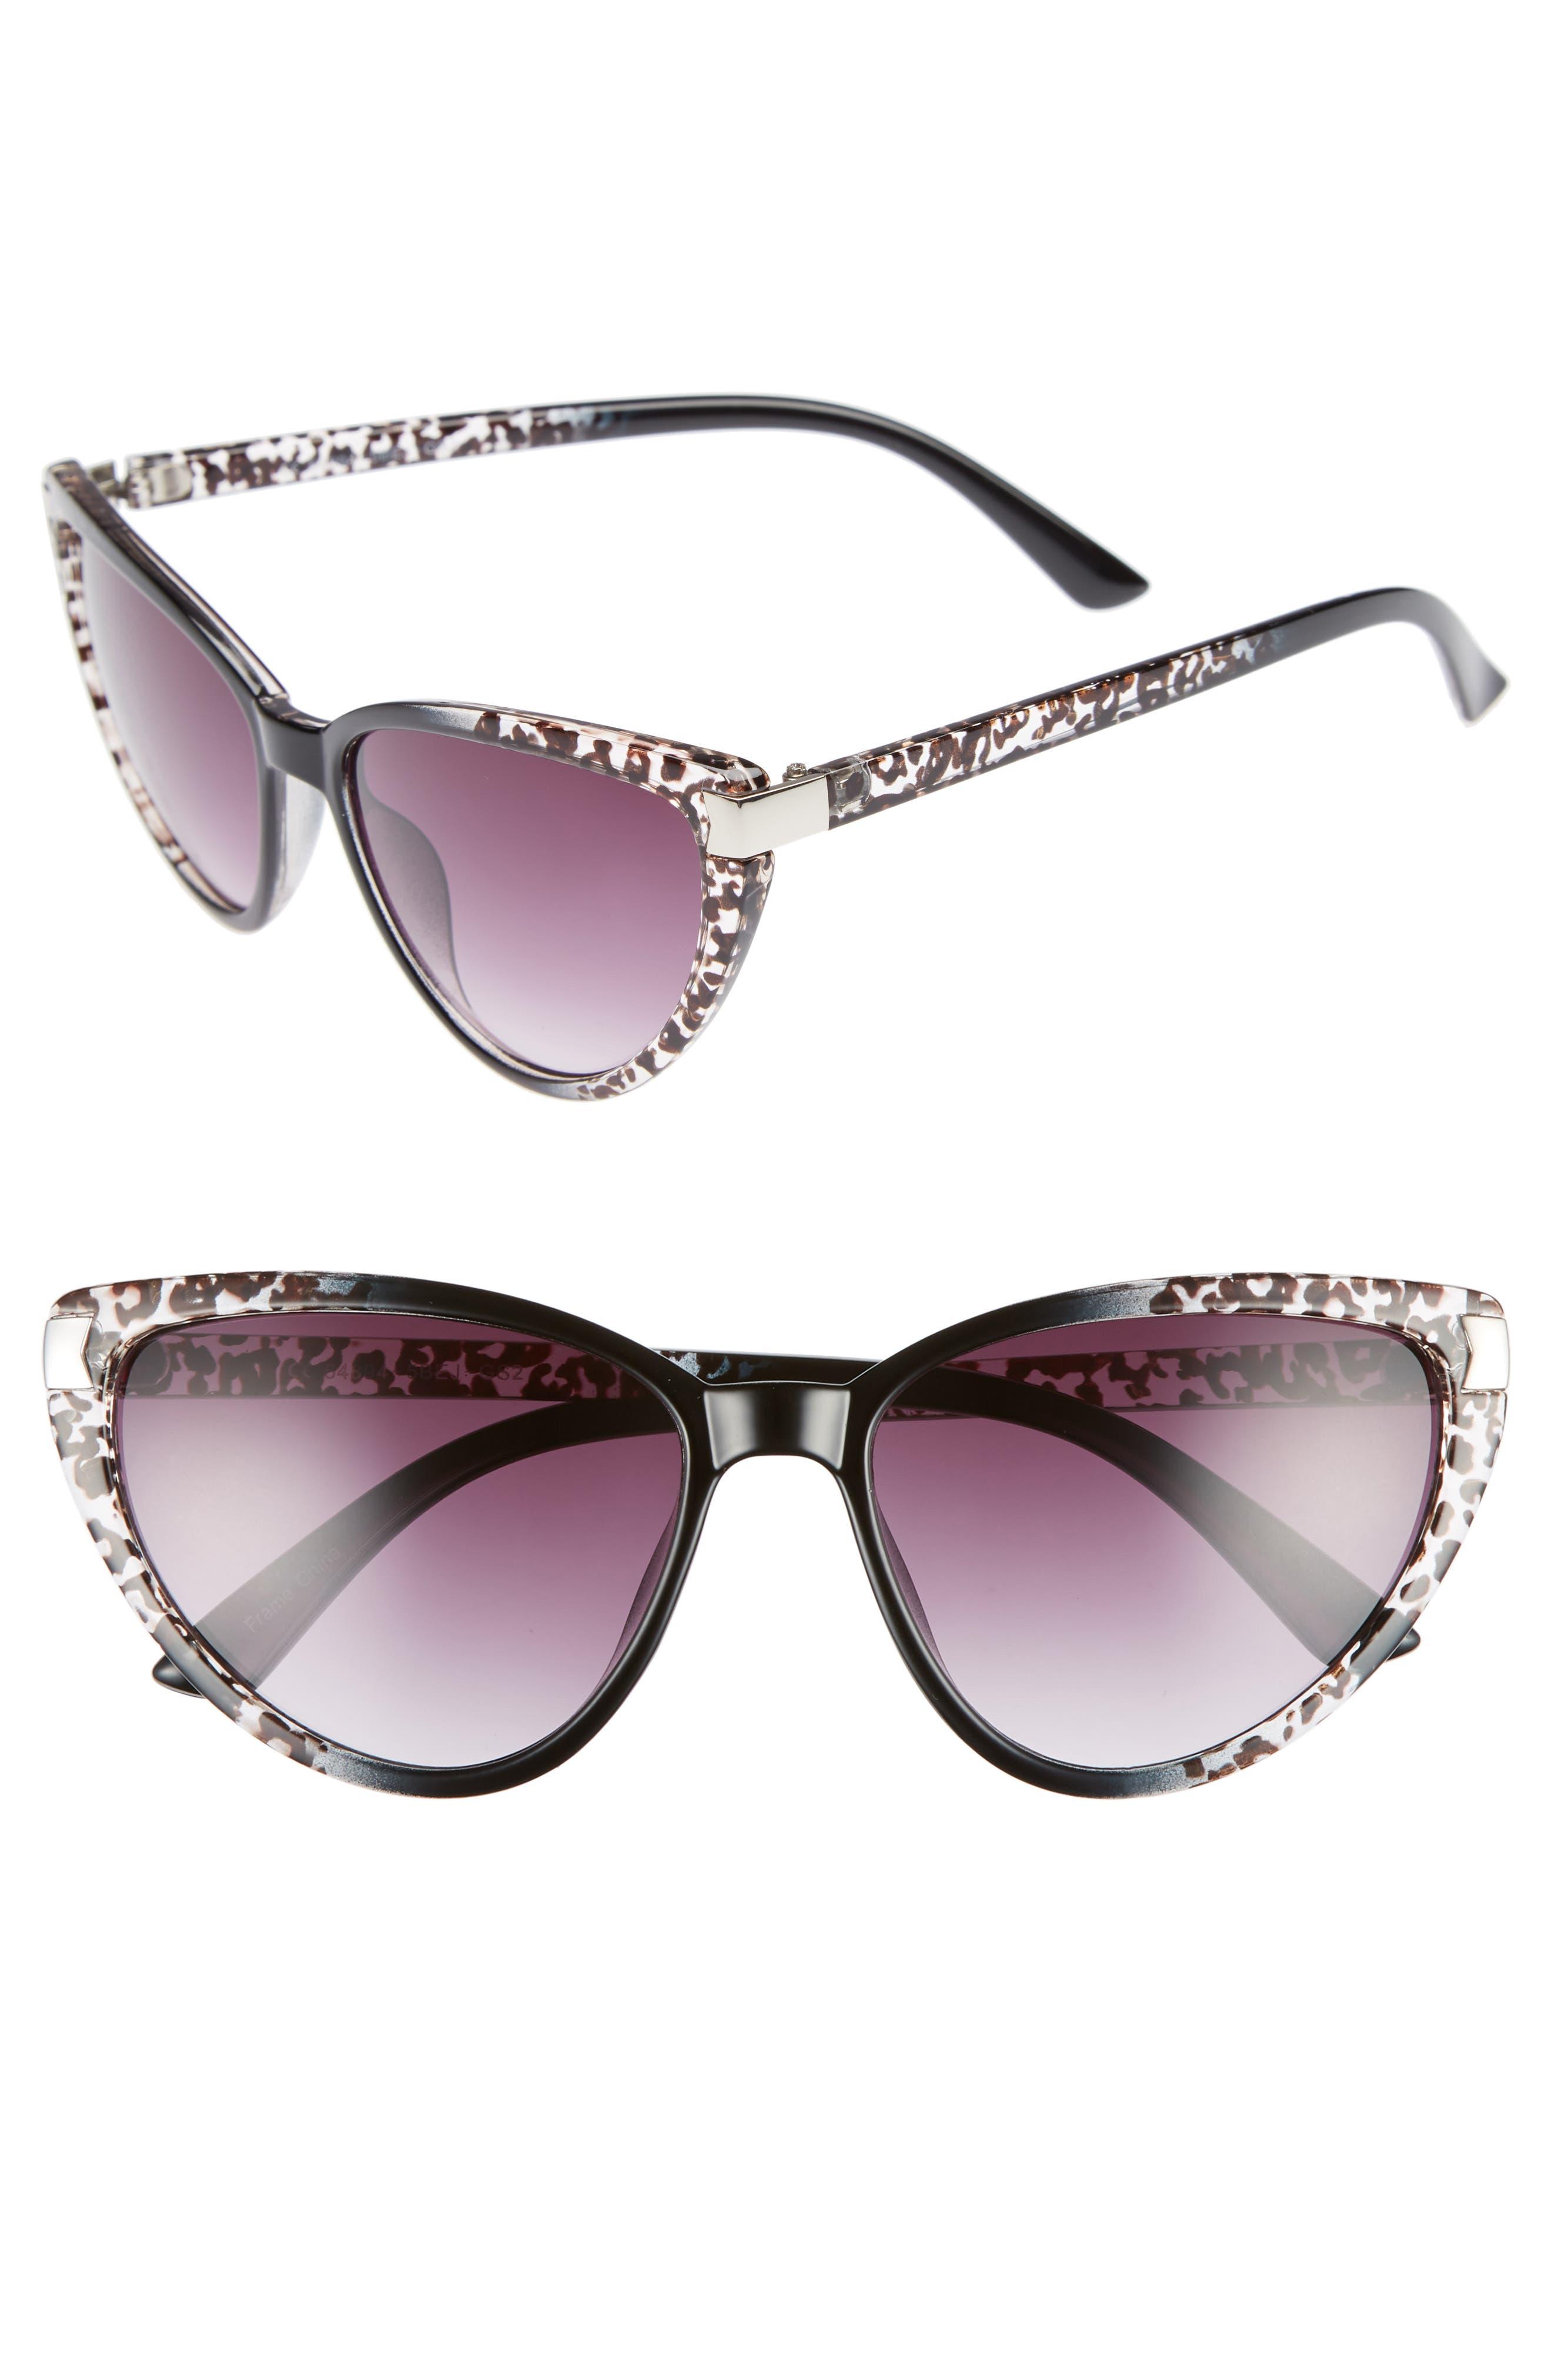 GLANCE EYEWEAR,                             57mm Spotted Cat Eye Sunglasses,                             Main thumbnail 1, color,                             001